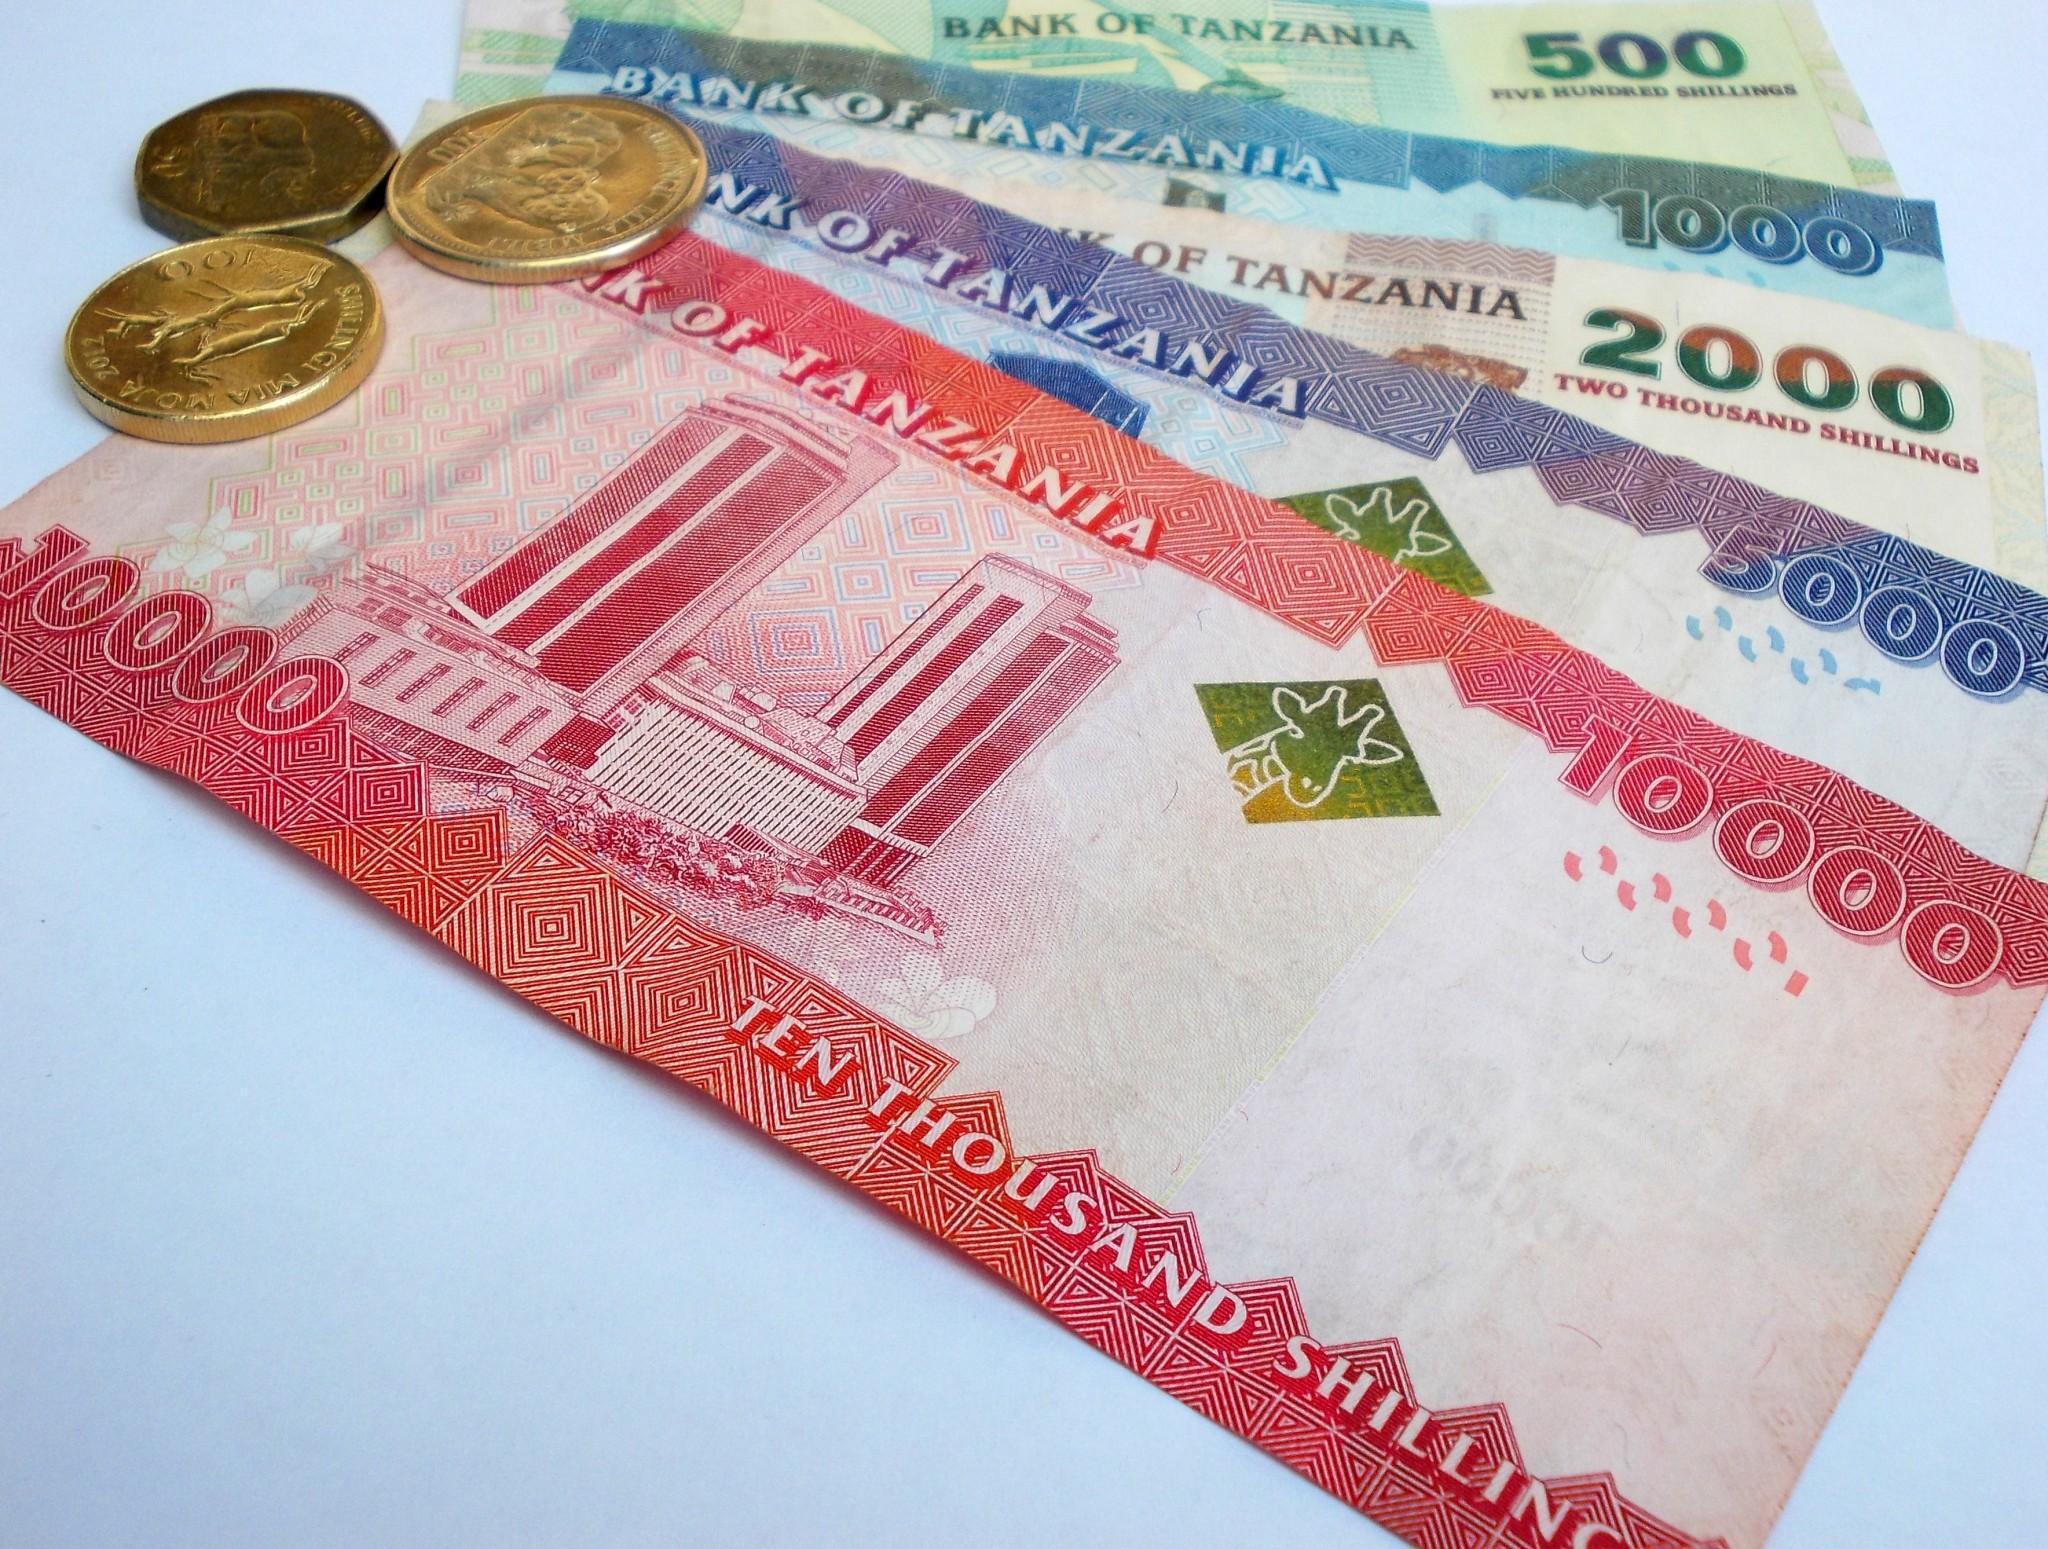 Tanzania Money Images Tanzanian Bank Notes Bills Money